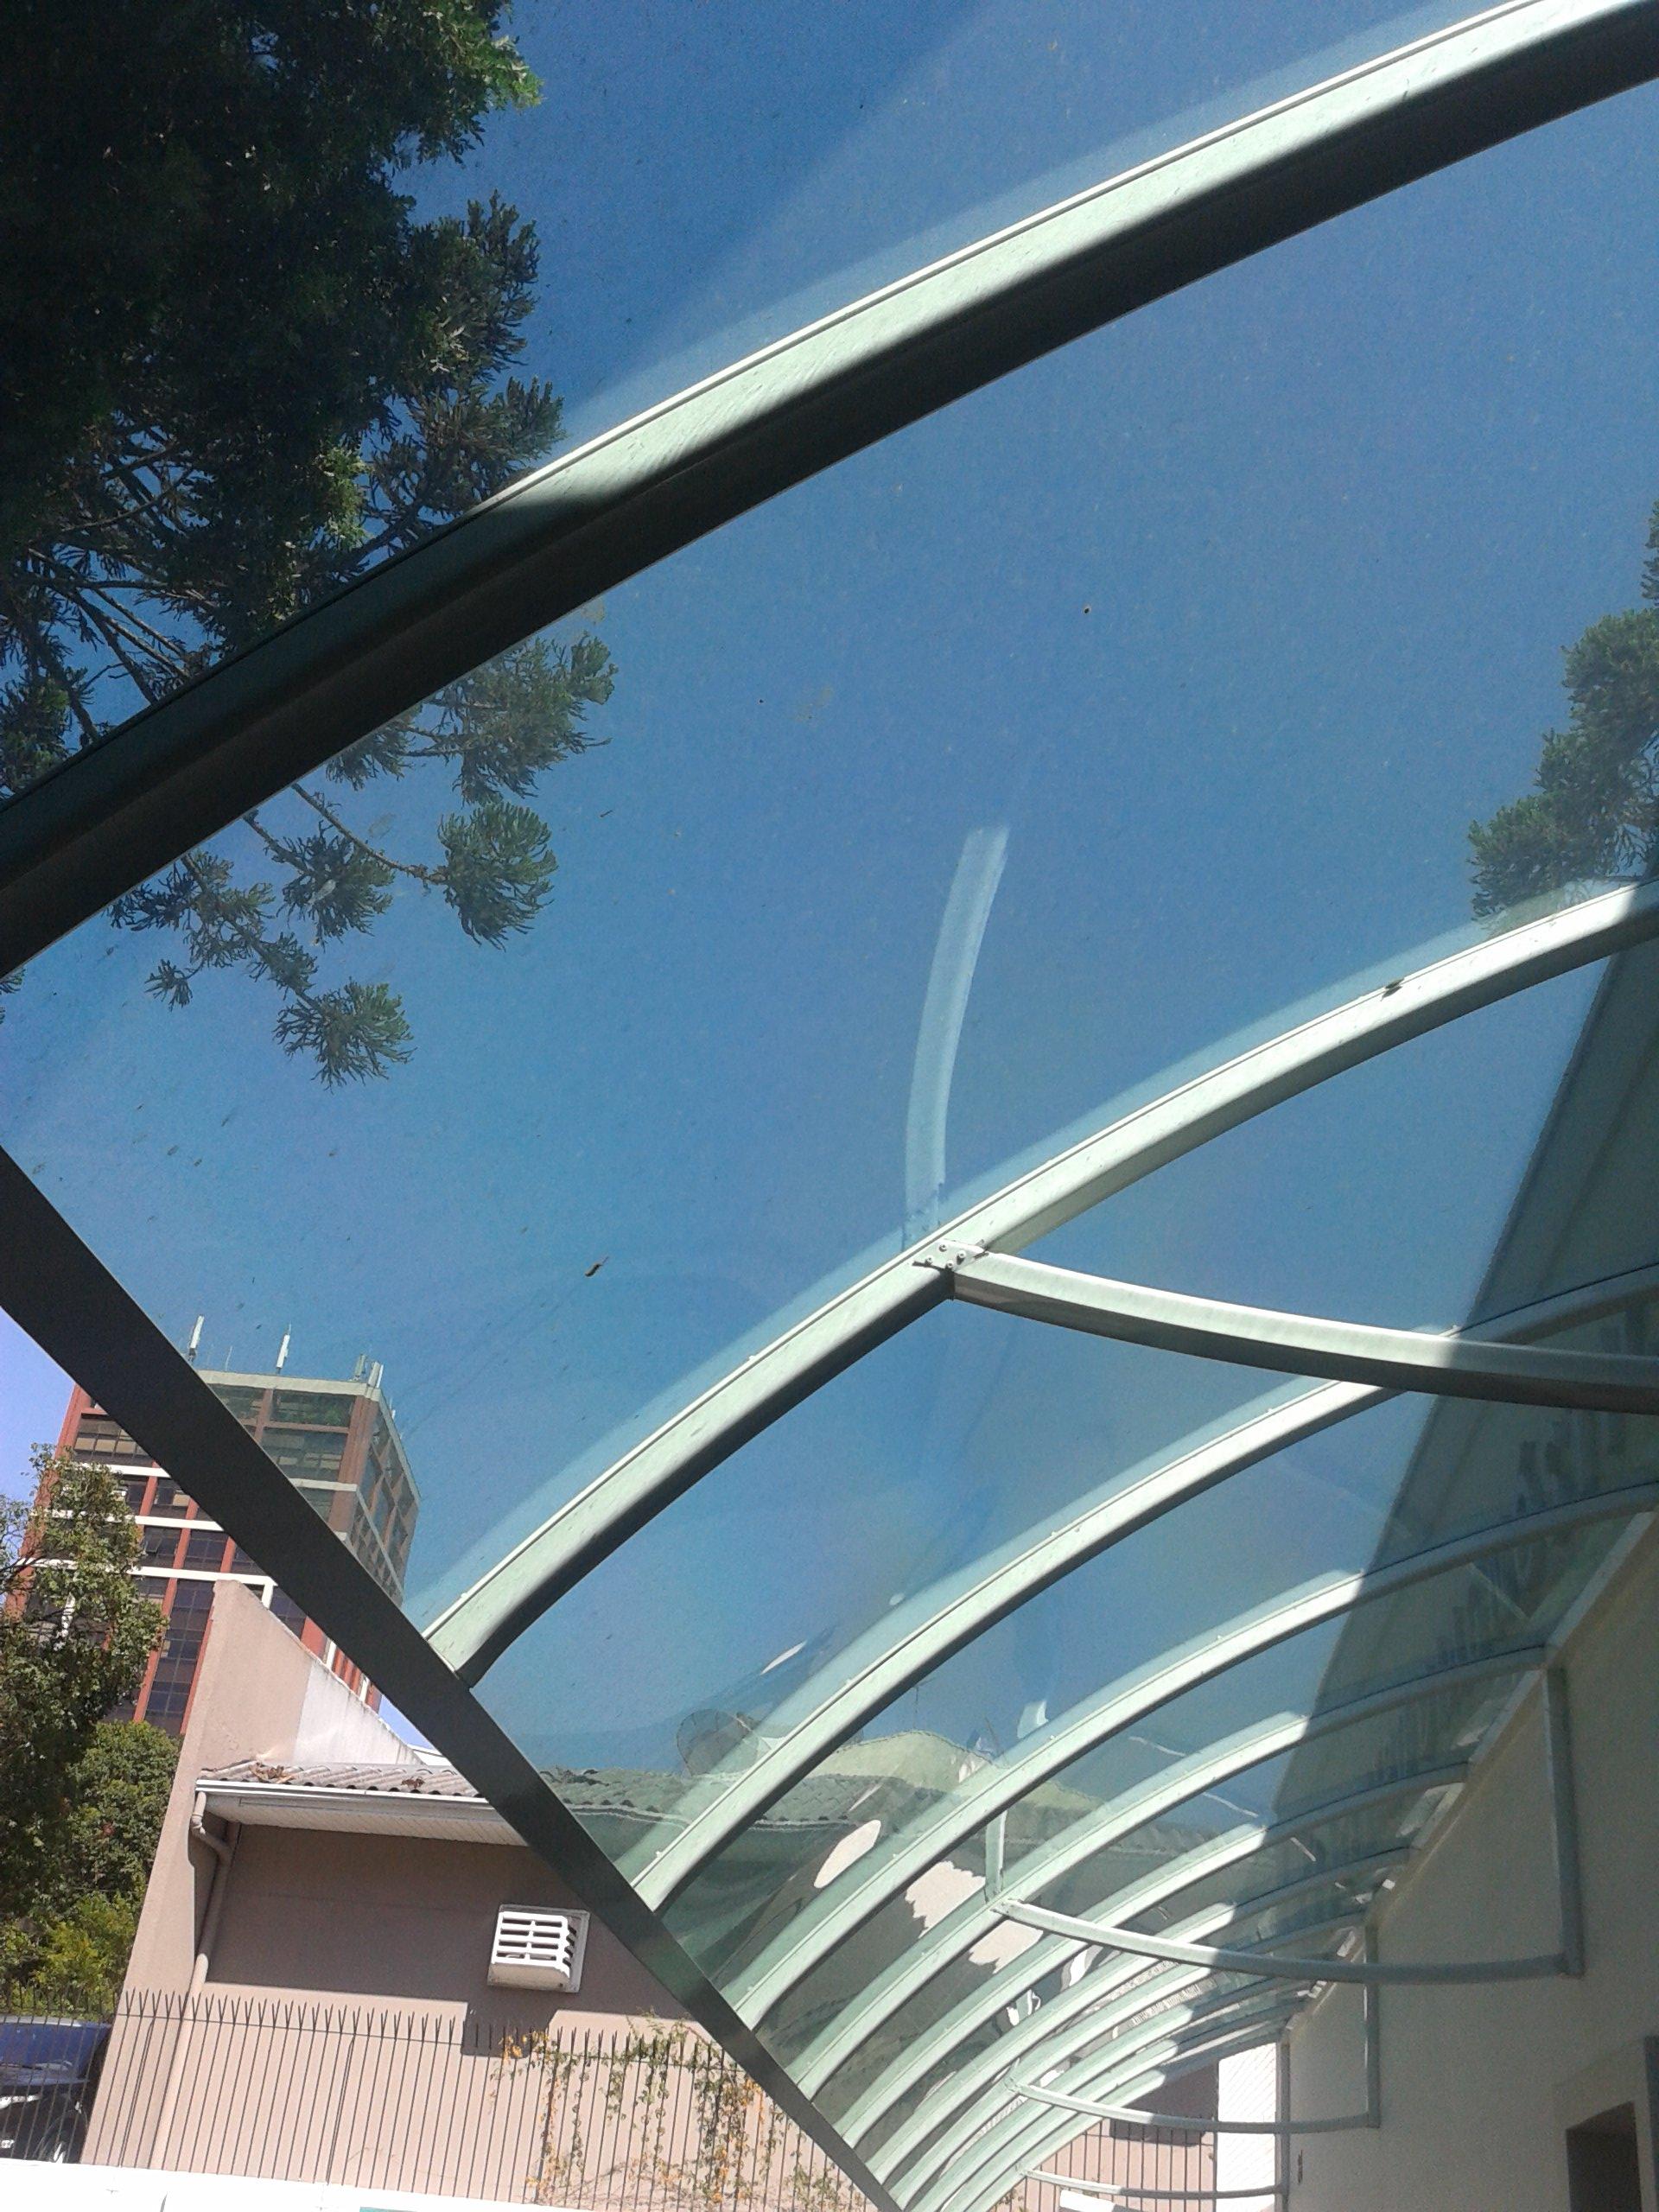 Chapas de policarbonato transparente polysolution - Placa de policarbonato precio ...